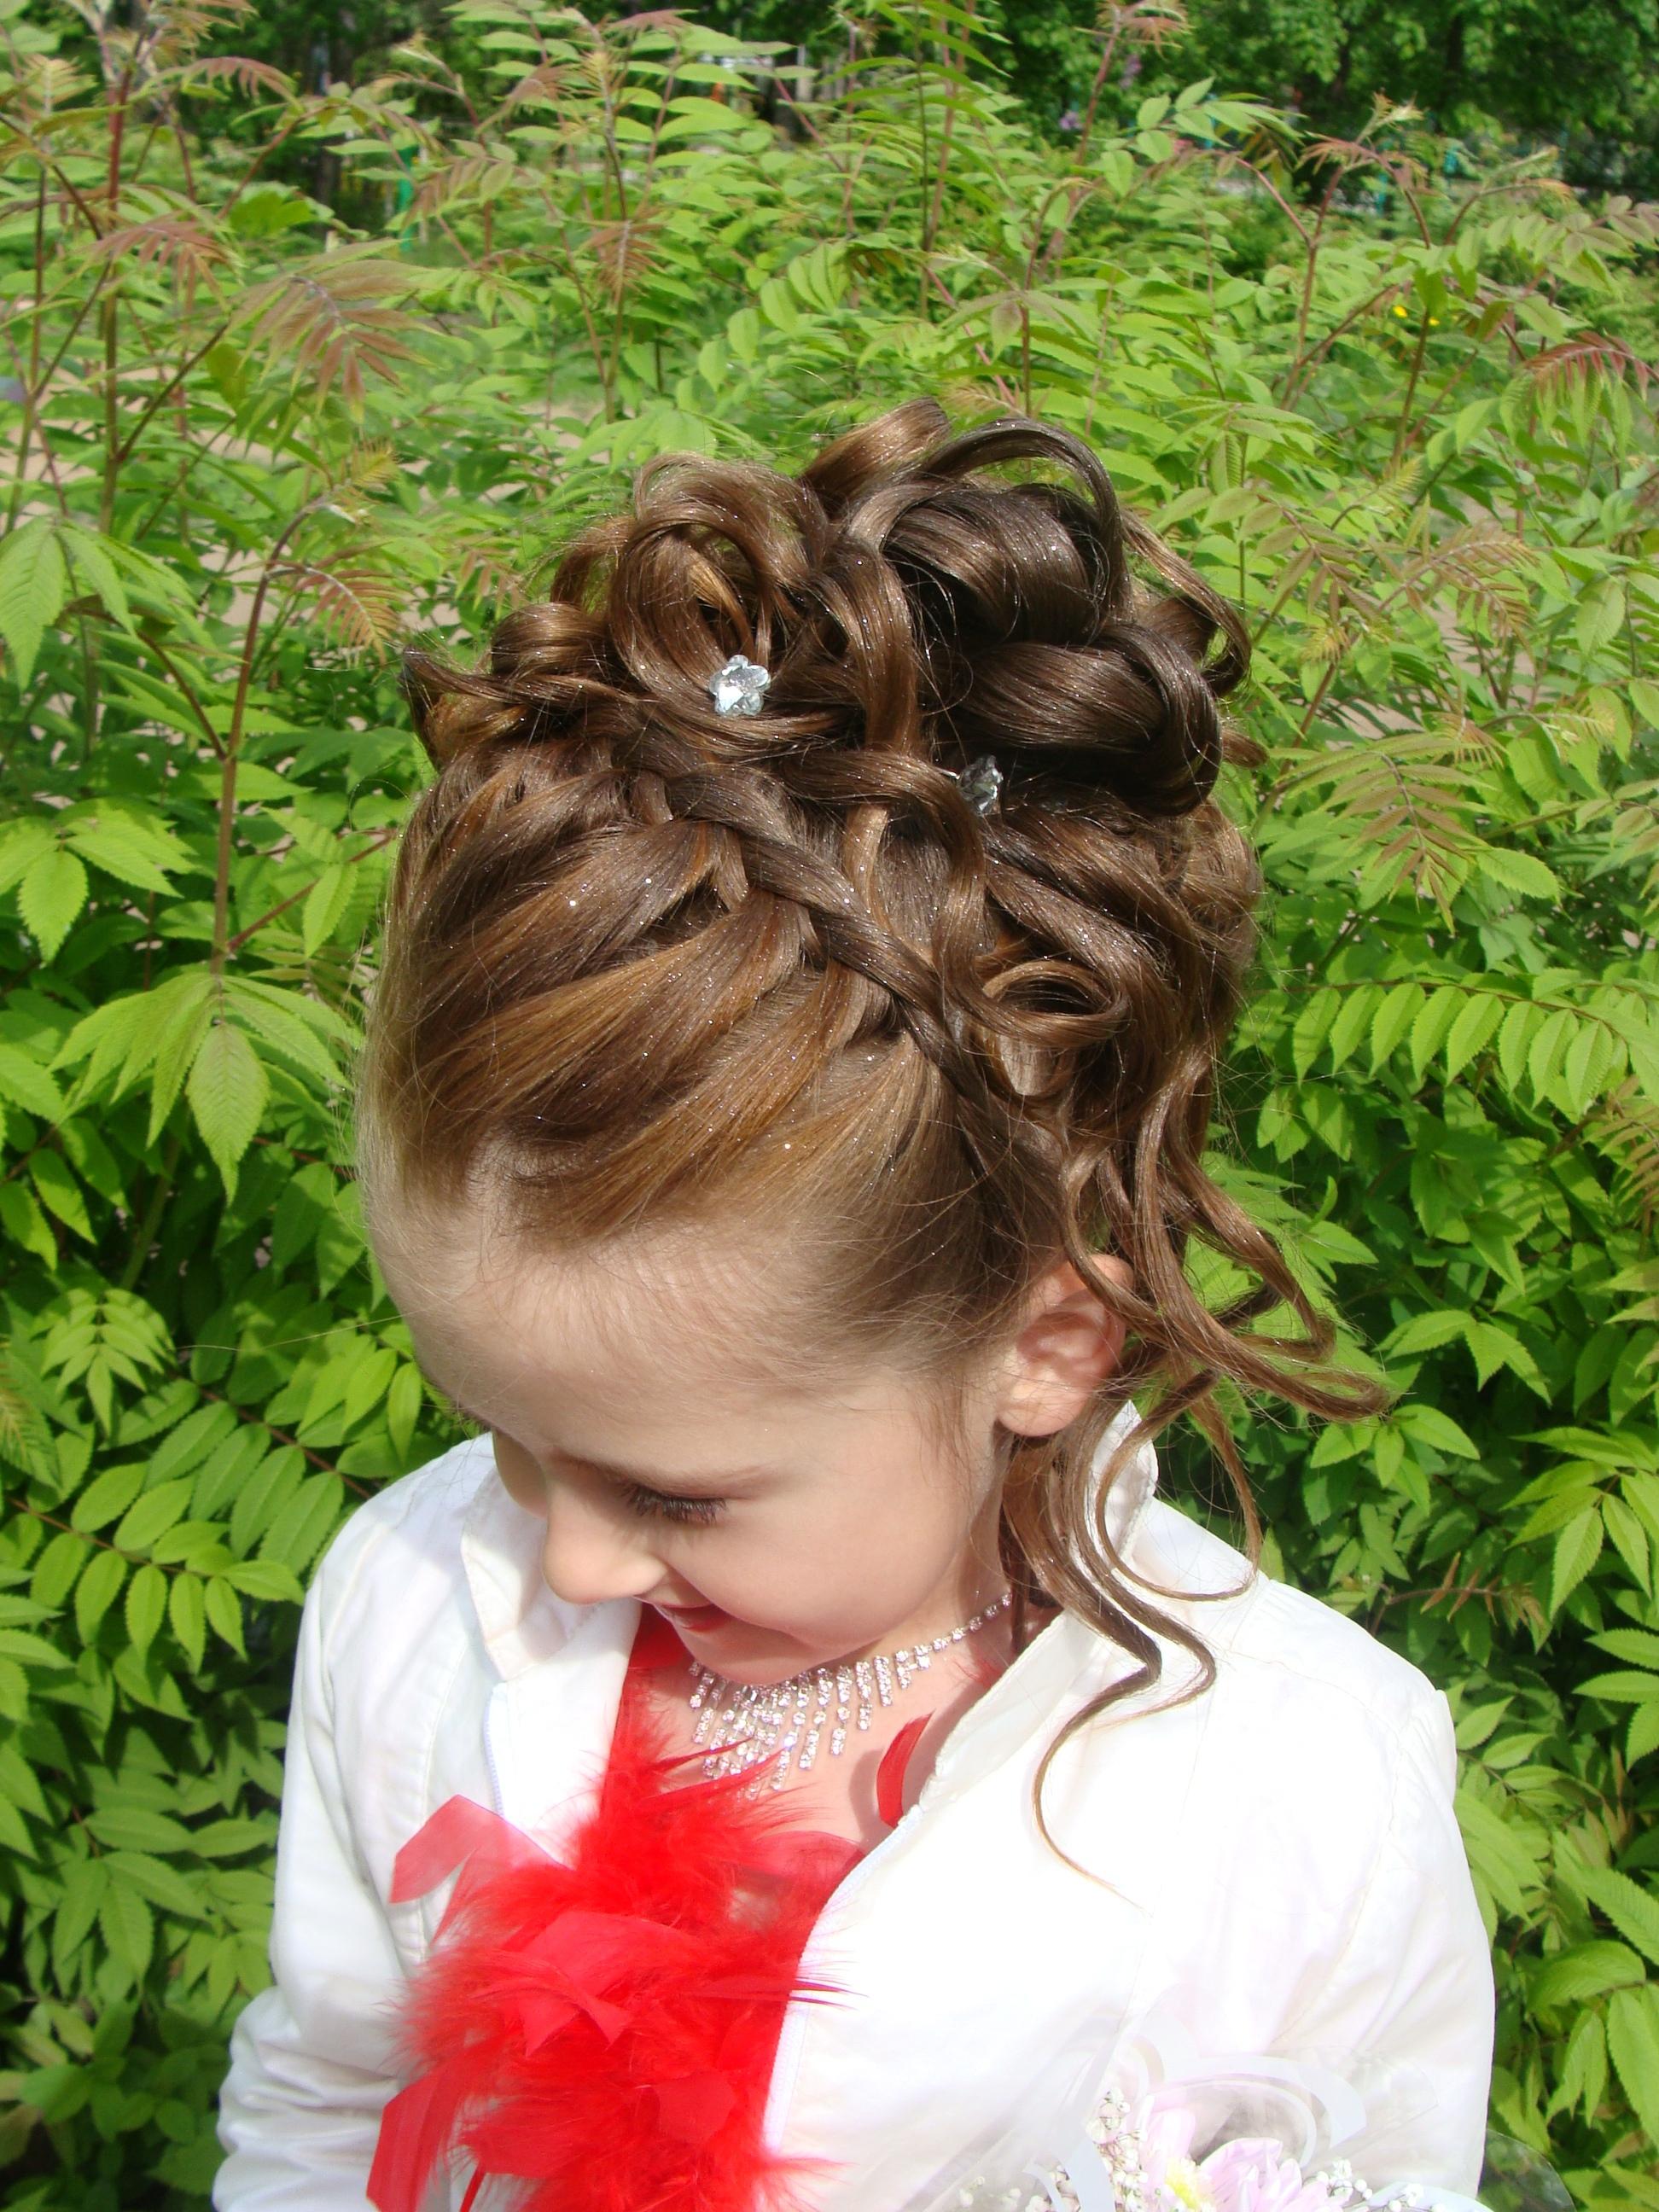 Браслет из кожи косичкой косички с лентами короткие волосы фото